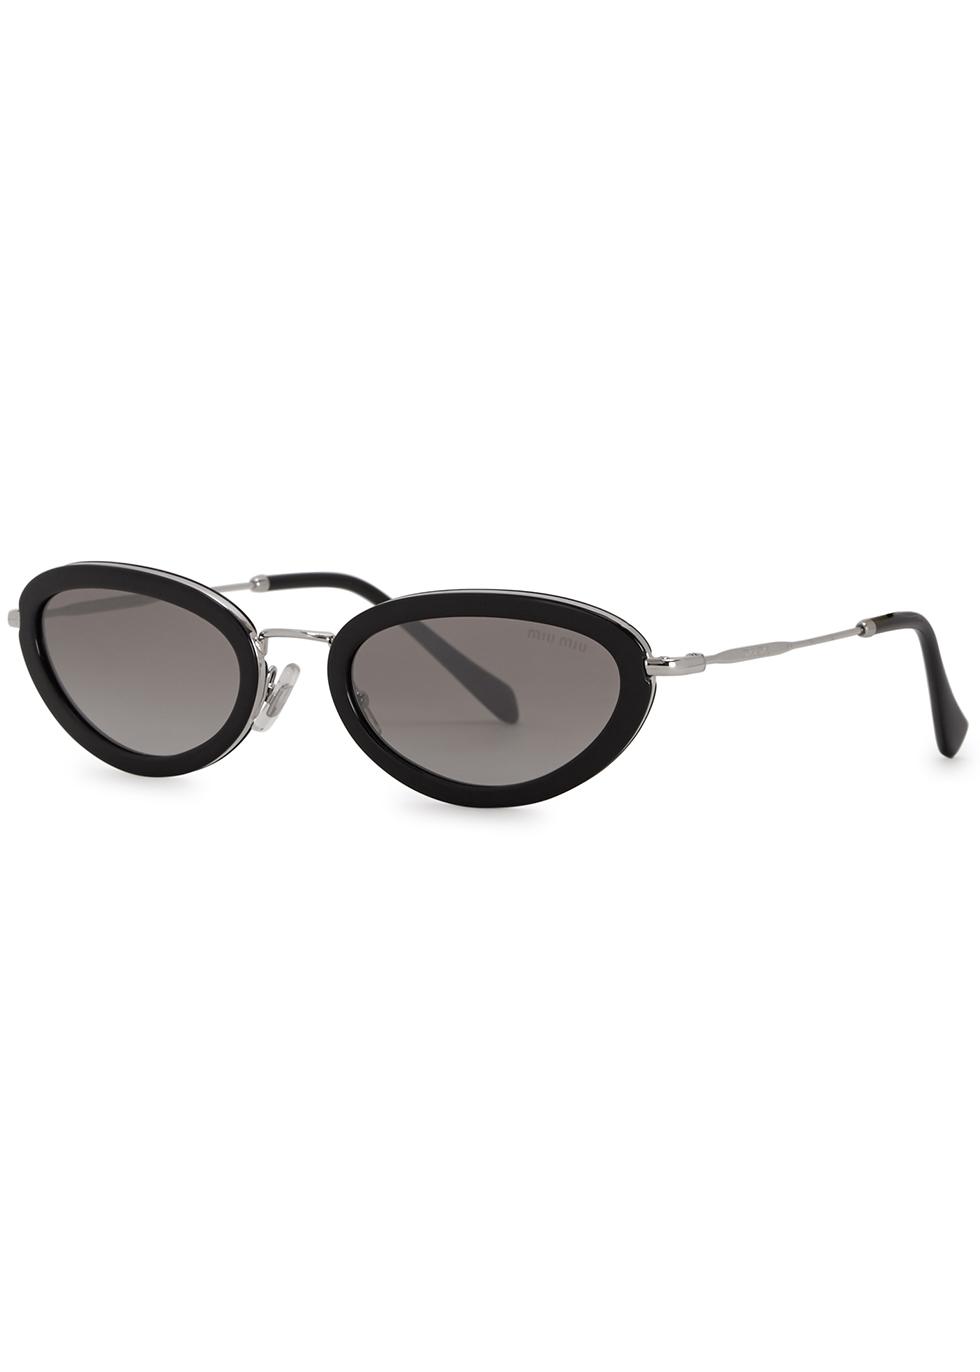 Mirrored oval-frame sunglasses - Miu Miu